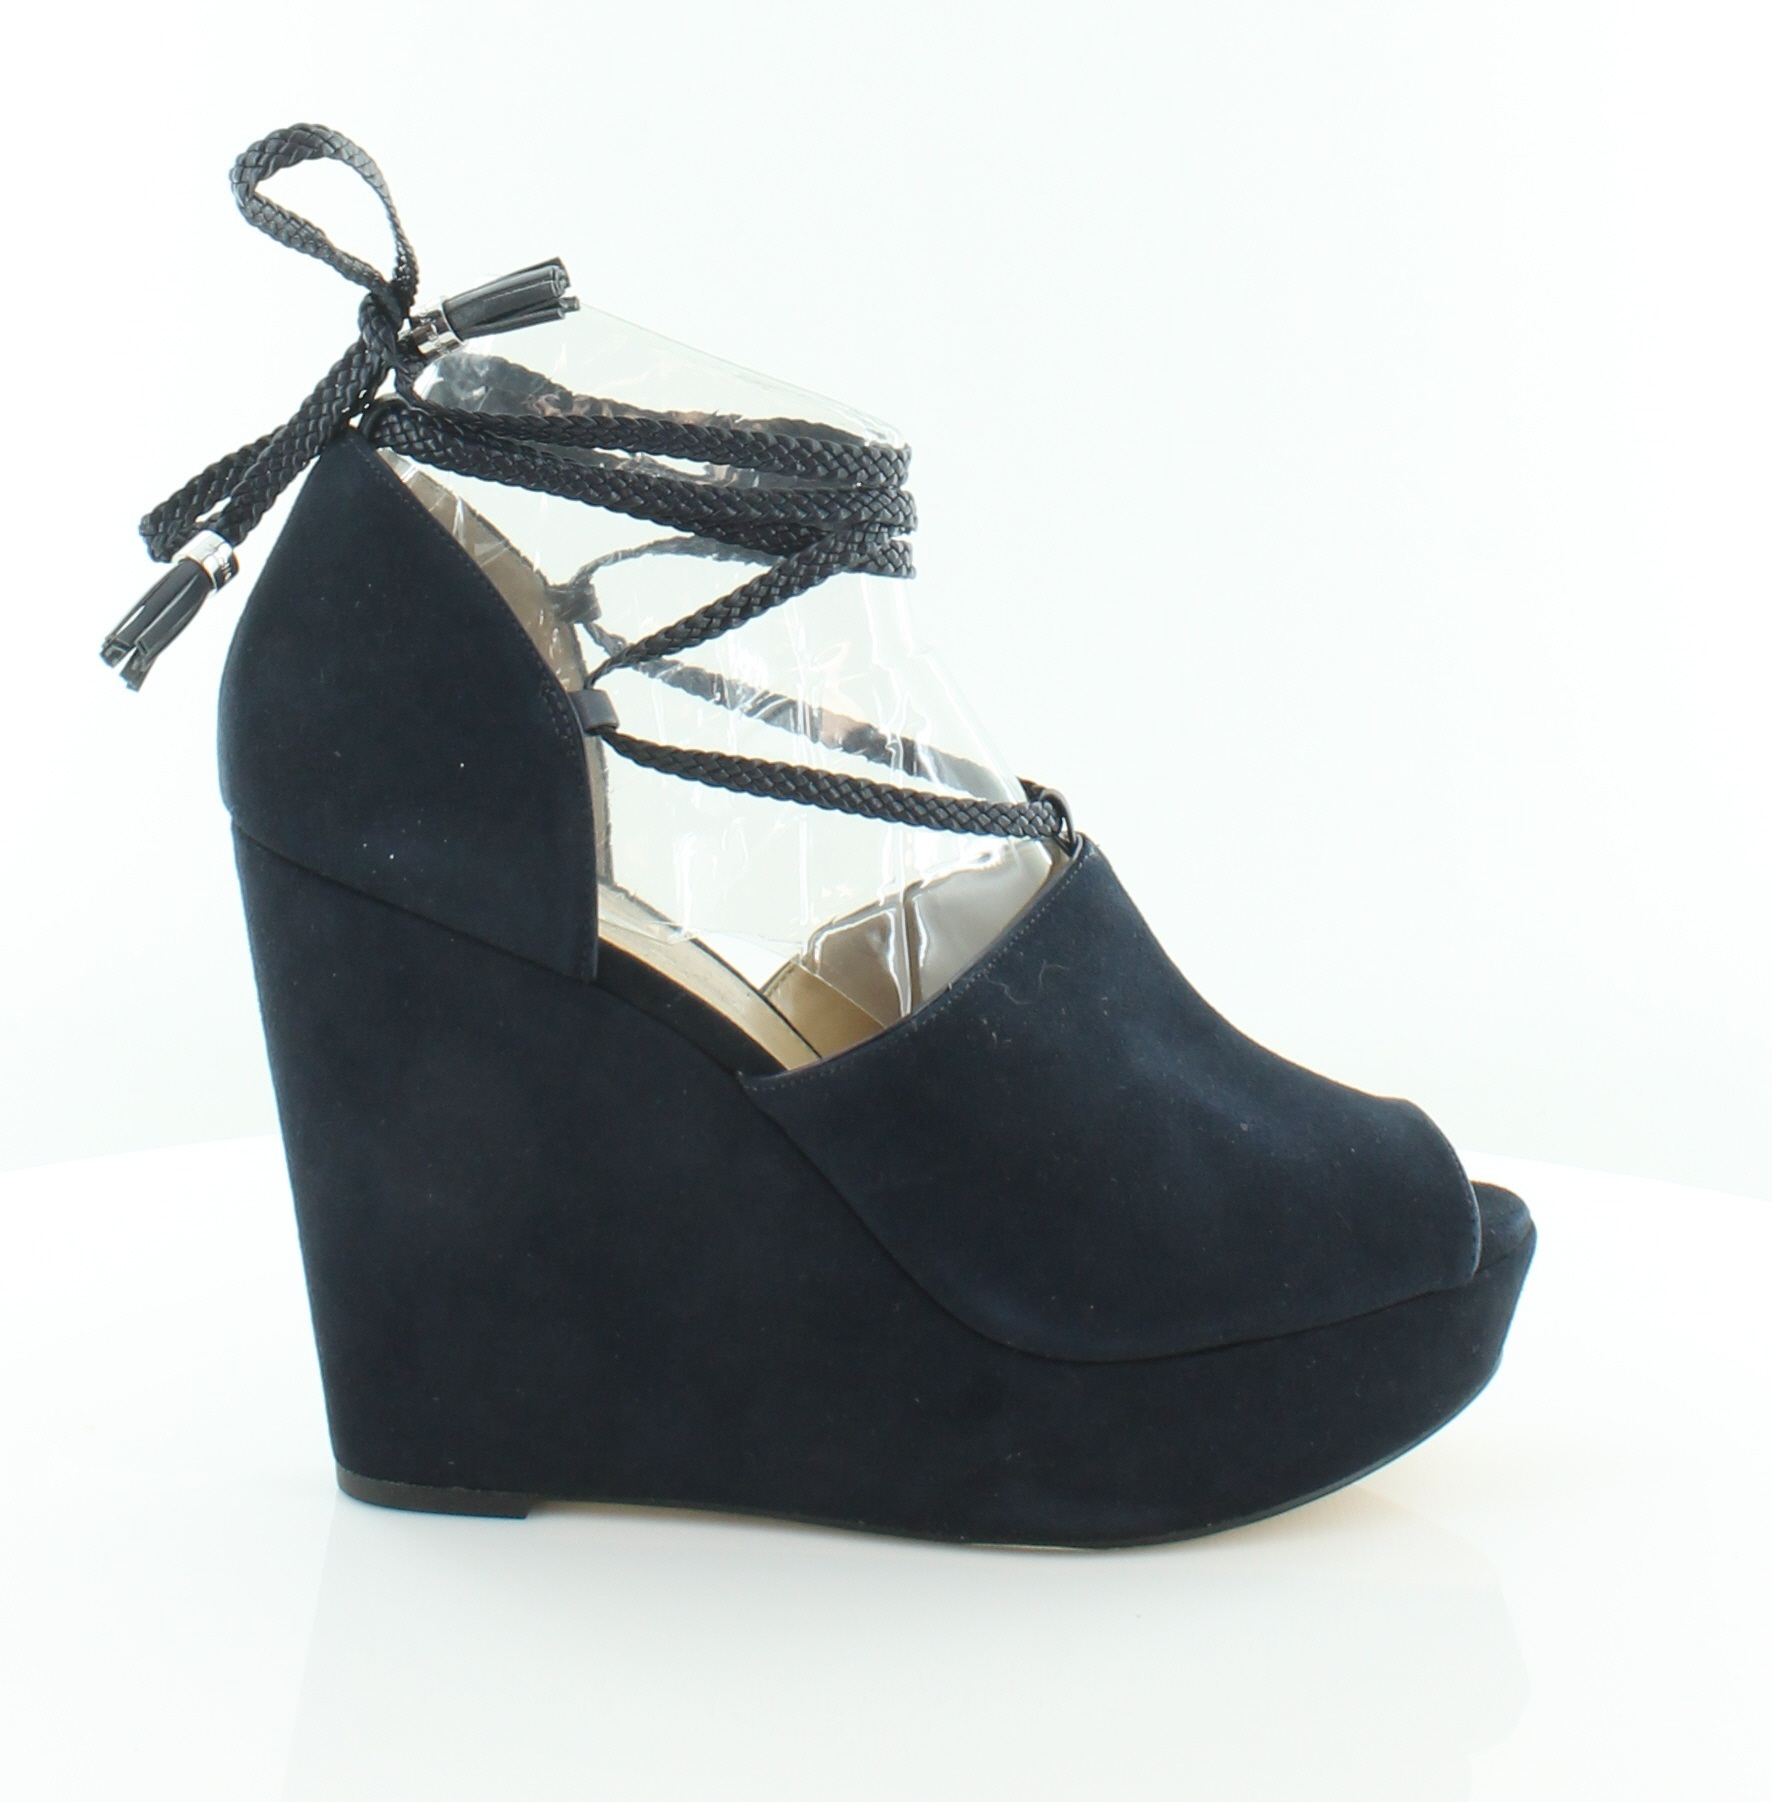 fd44db913b4 Image is loading Michael-Kors-Hastings-Wedge-Sandals-Blue-Womens-Shoes-